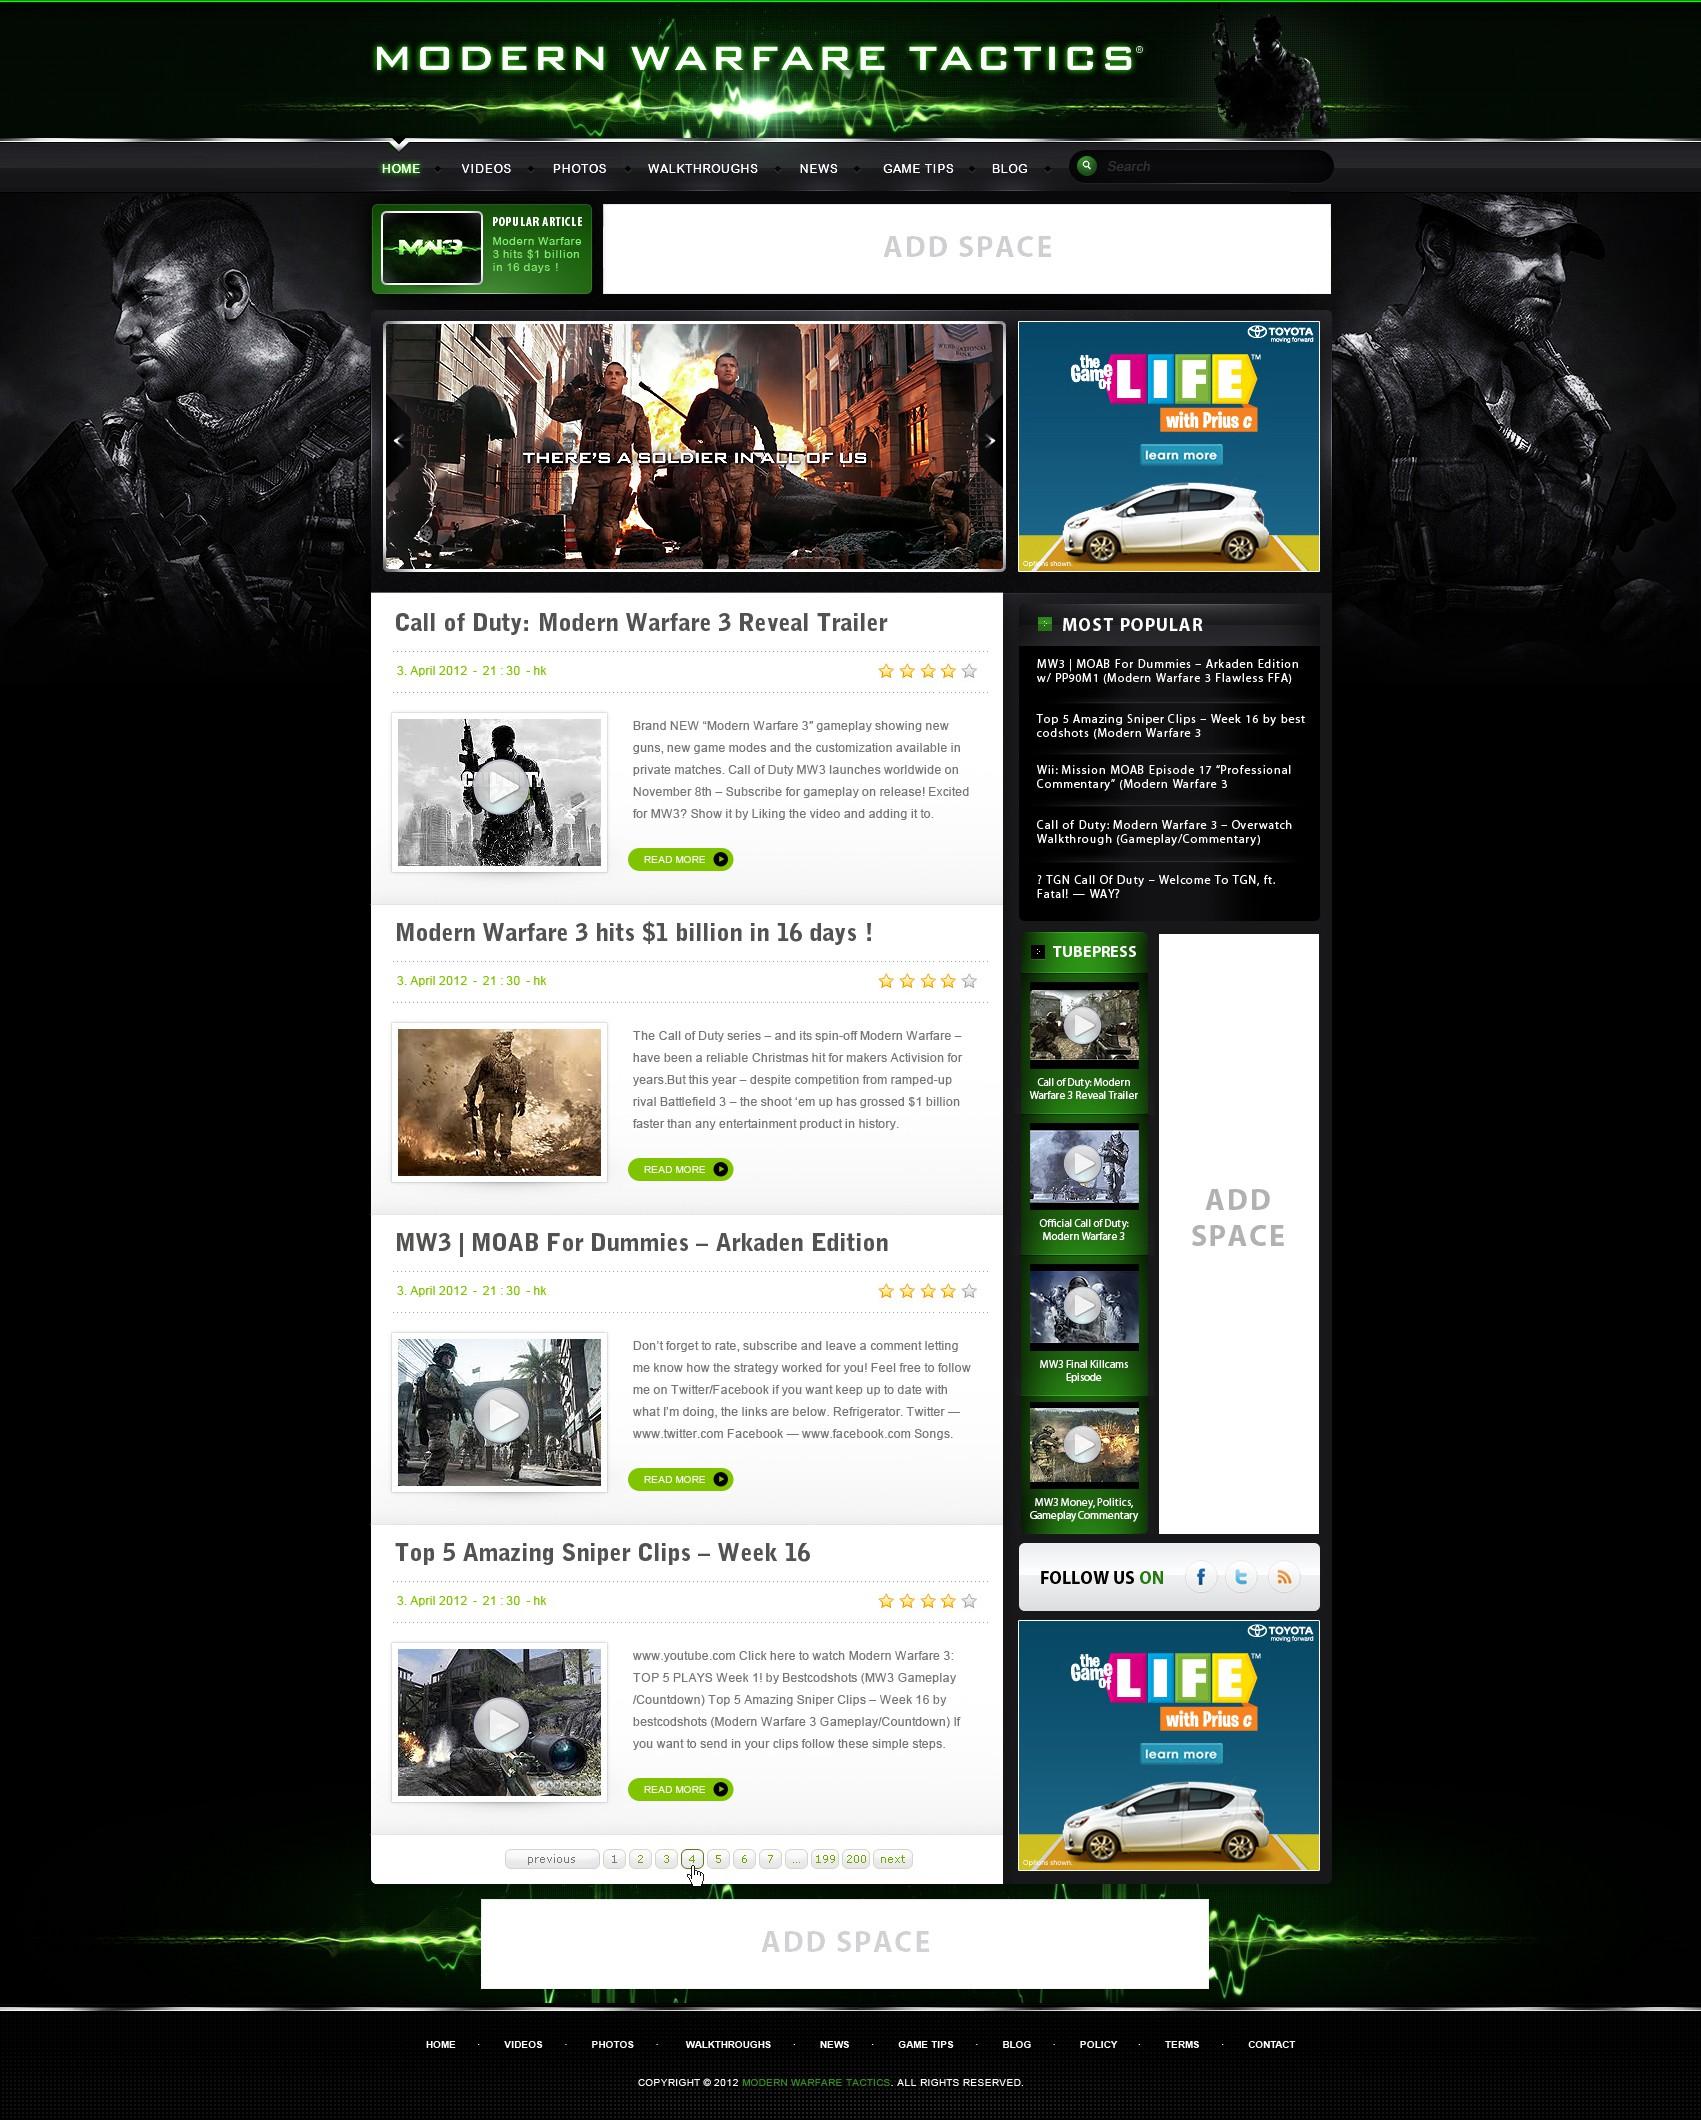 Ozus Media  needs a new website design